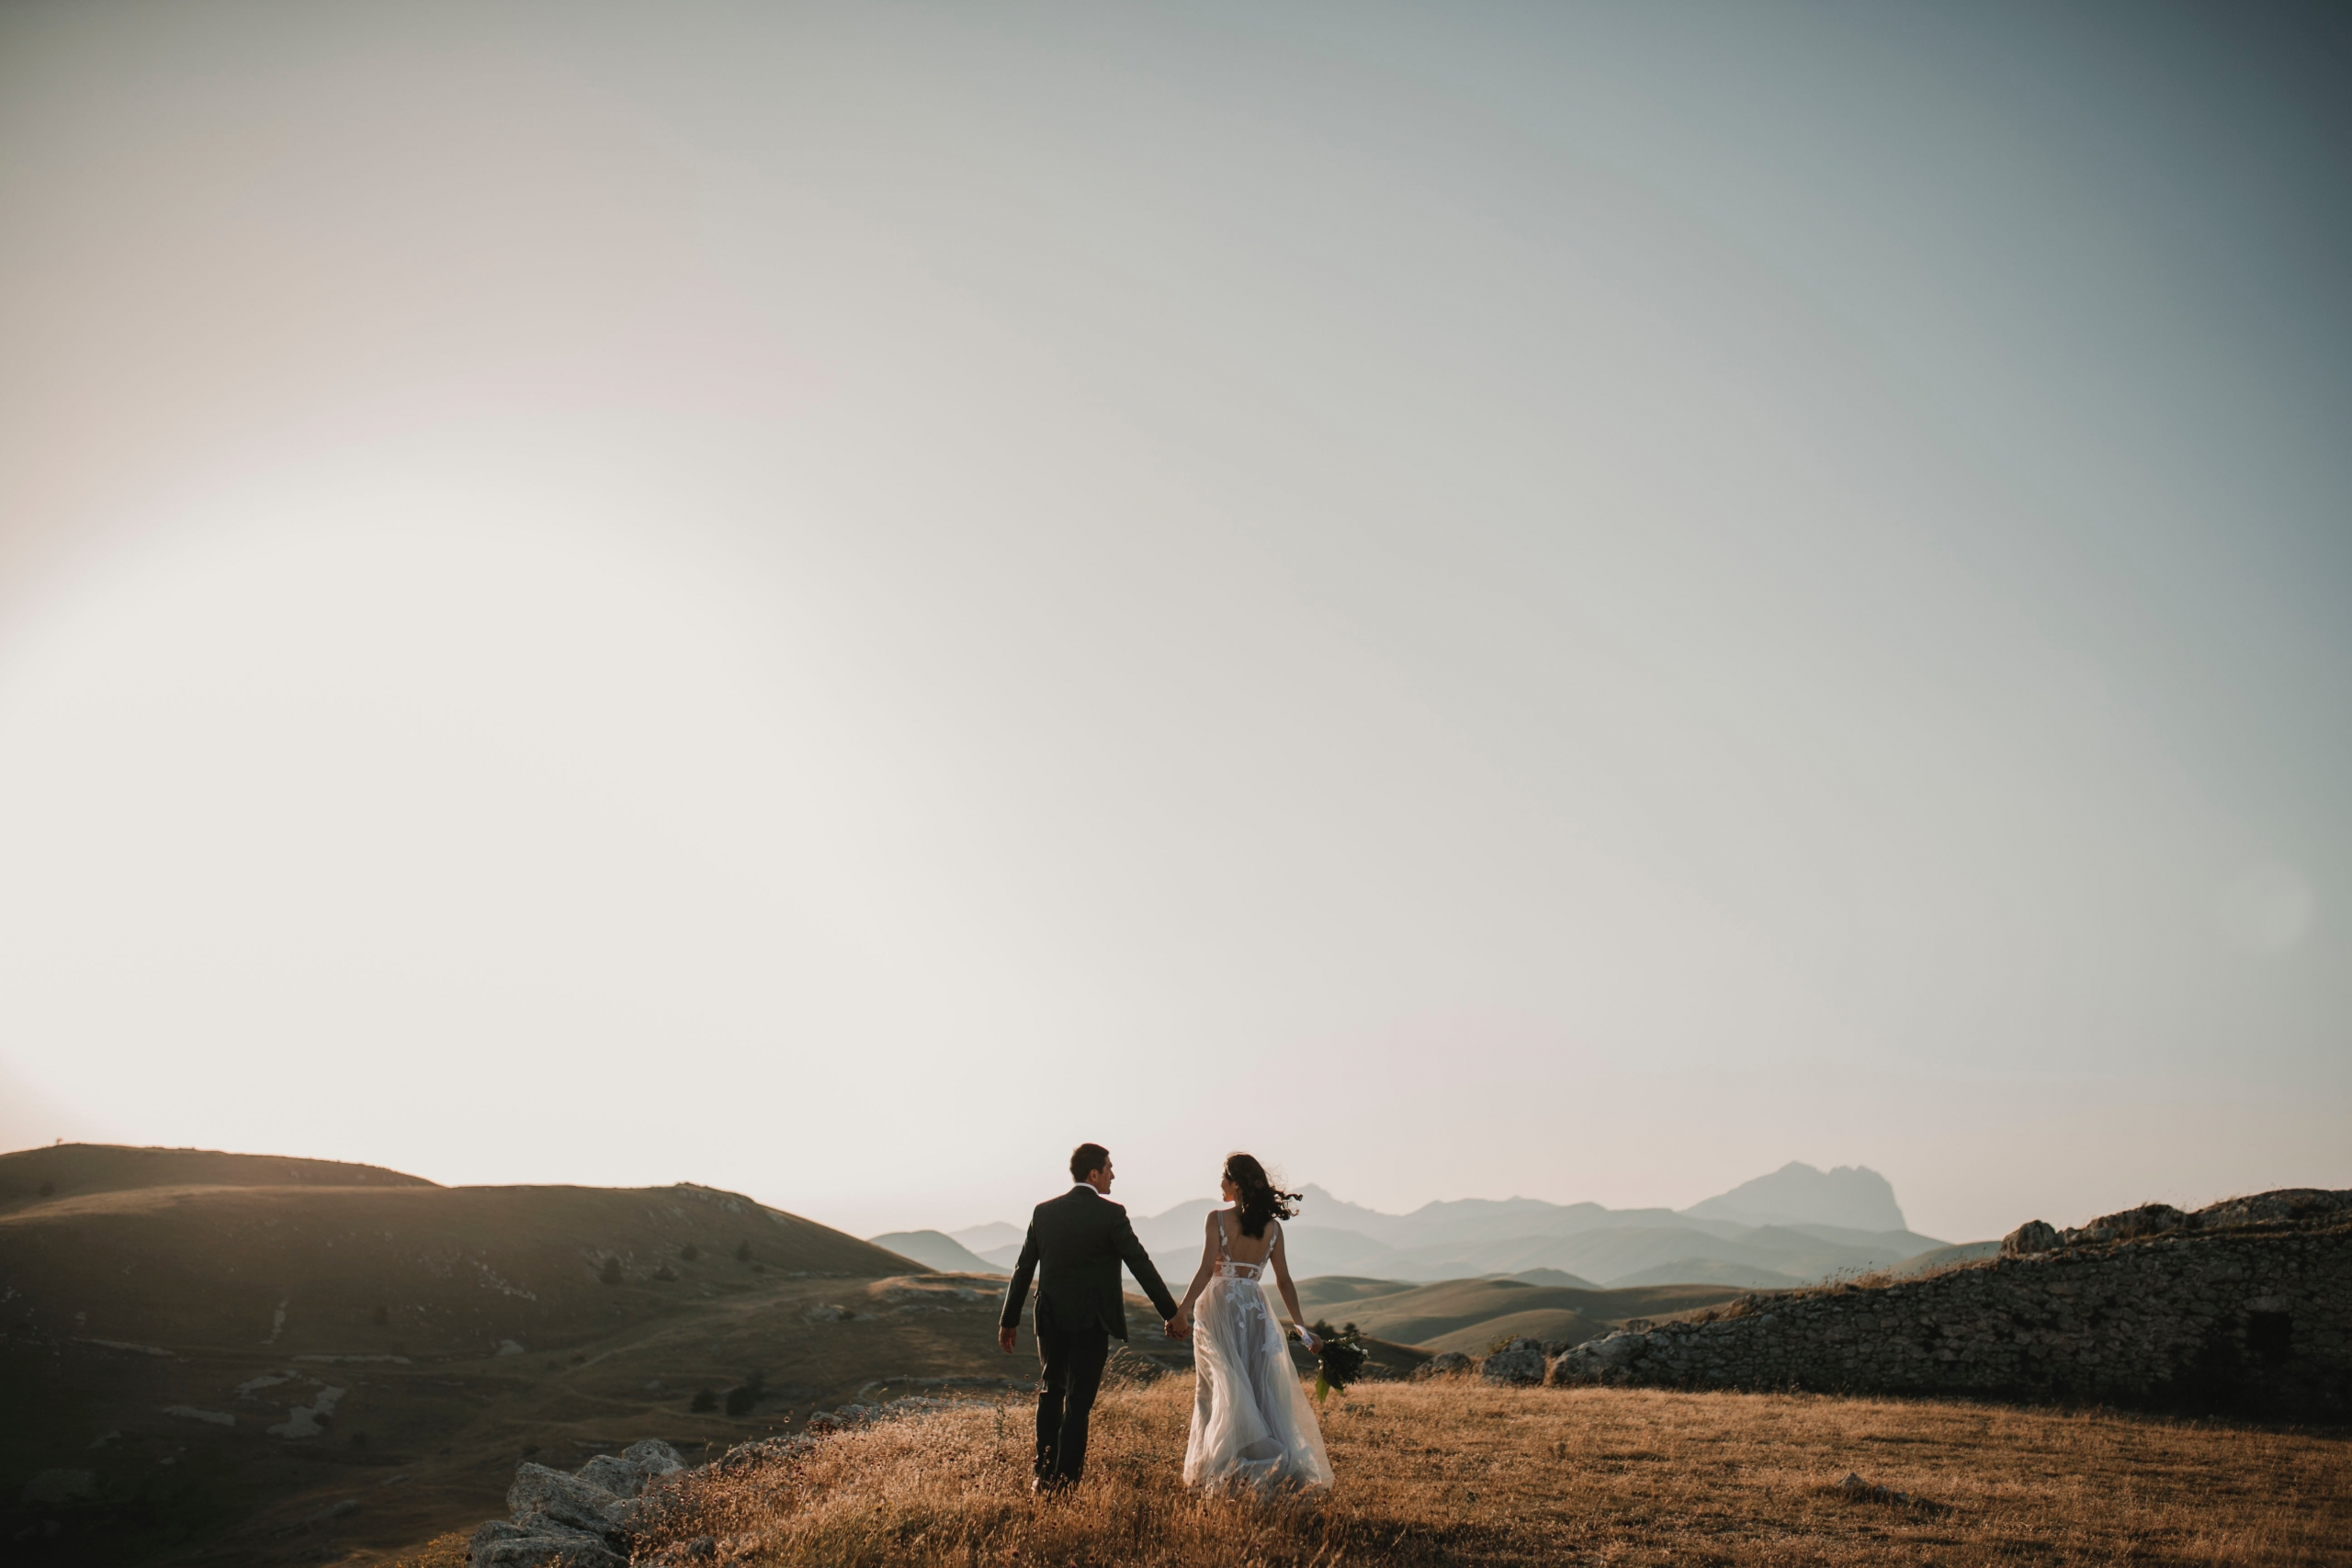 cómo aplazar mi boda